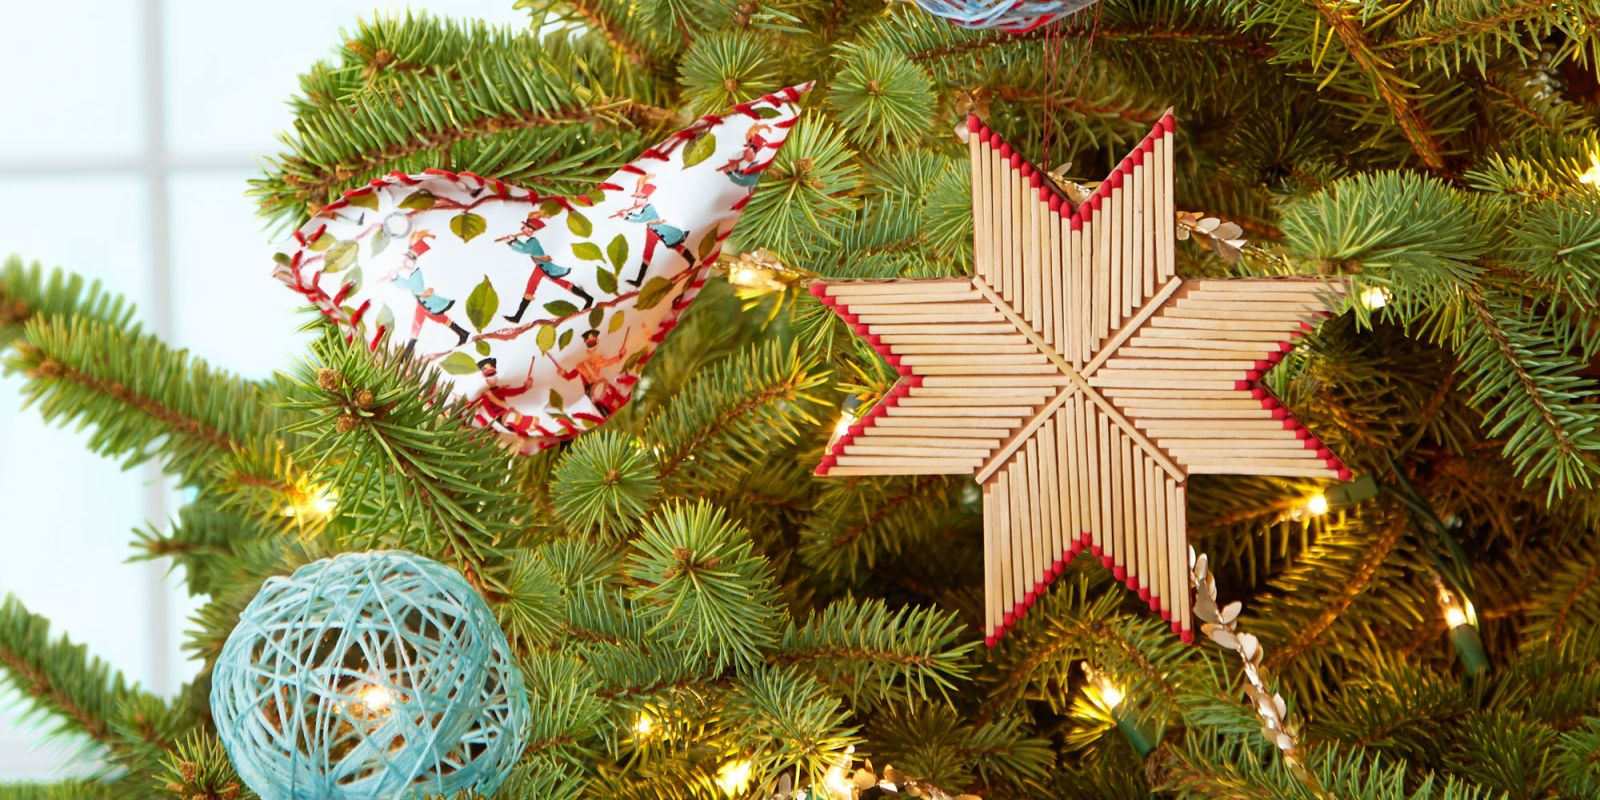 50 Diy Christmas Ornaments To Make Your Tree Truly One Of A Kind Diy Christmas Ornaments 50 Diy Christmas Ornaments Christmas Ornaments To Make